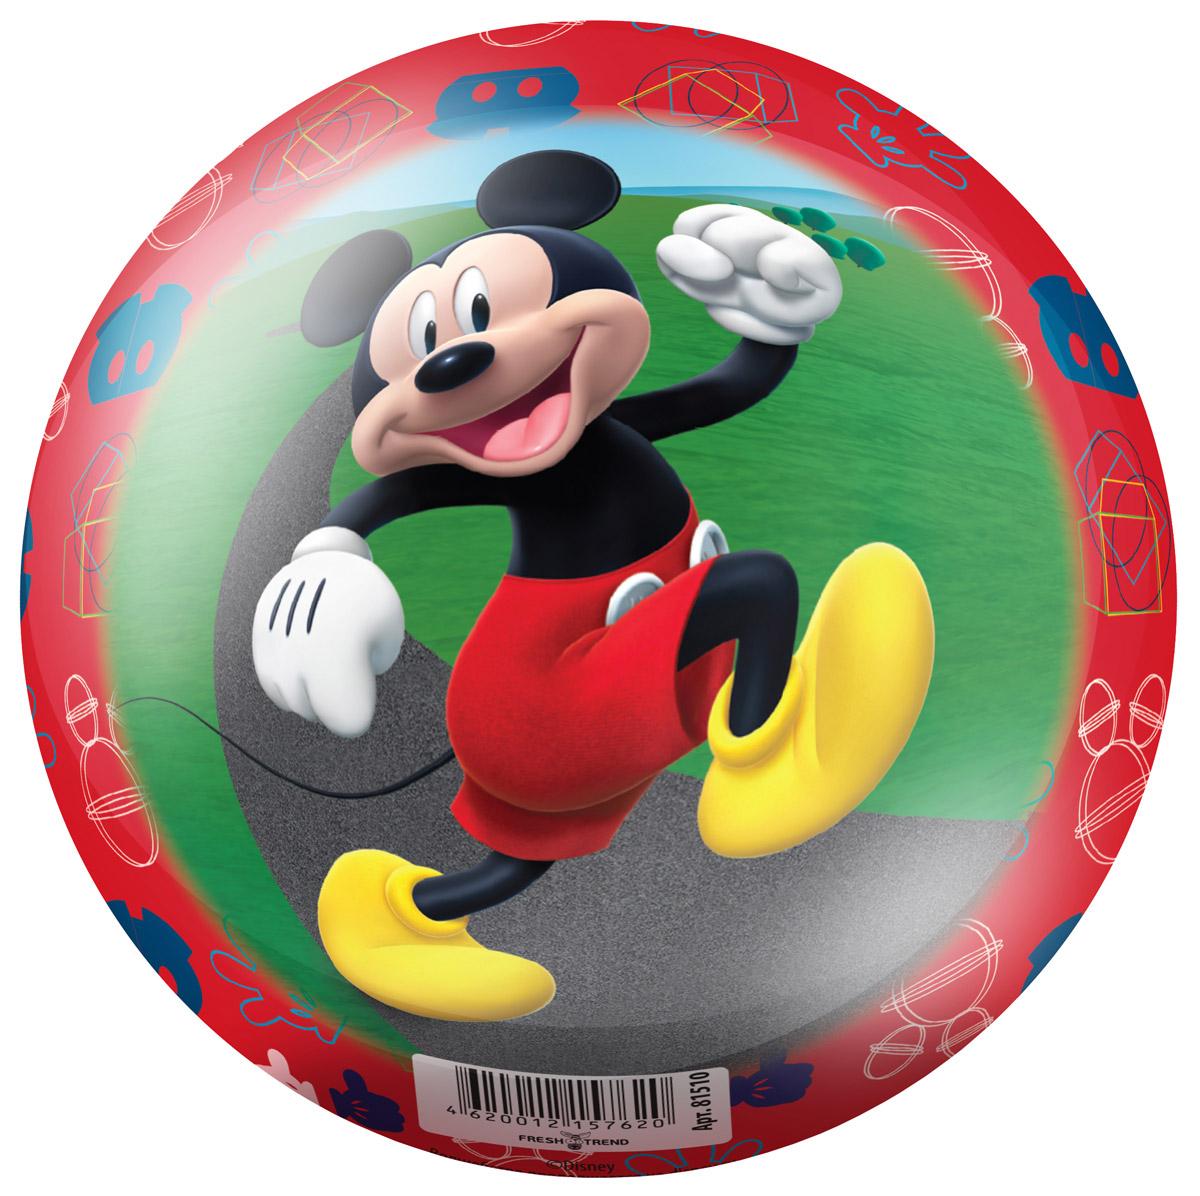 Fresh Trend Мяч Микки цвет красный 15 см lori магниты из гипса клуб микки мауса lori